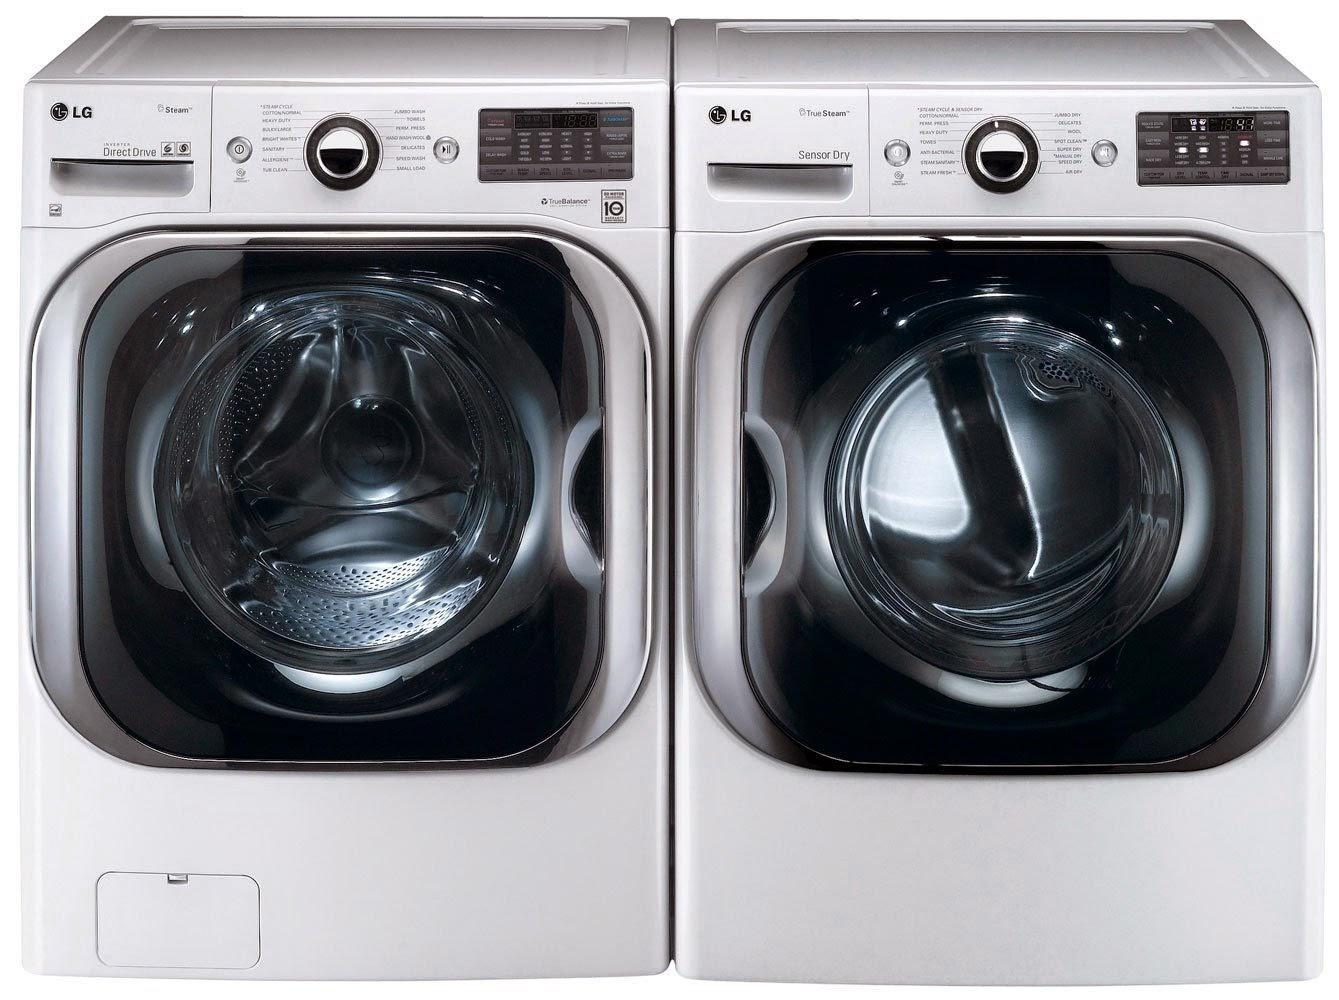 Lg An Mega Capacity 5 1 Cf Turbowash Steam Washer With 9 0 Dryer